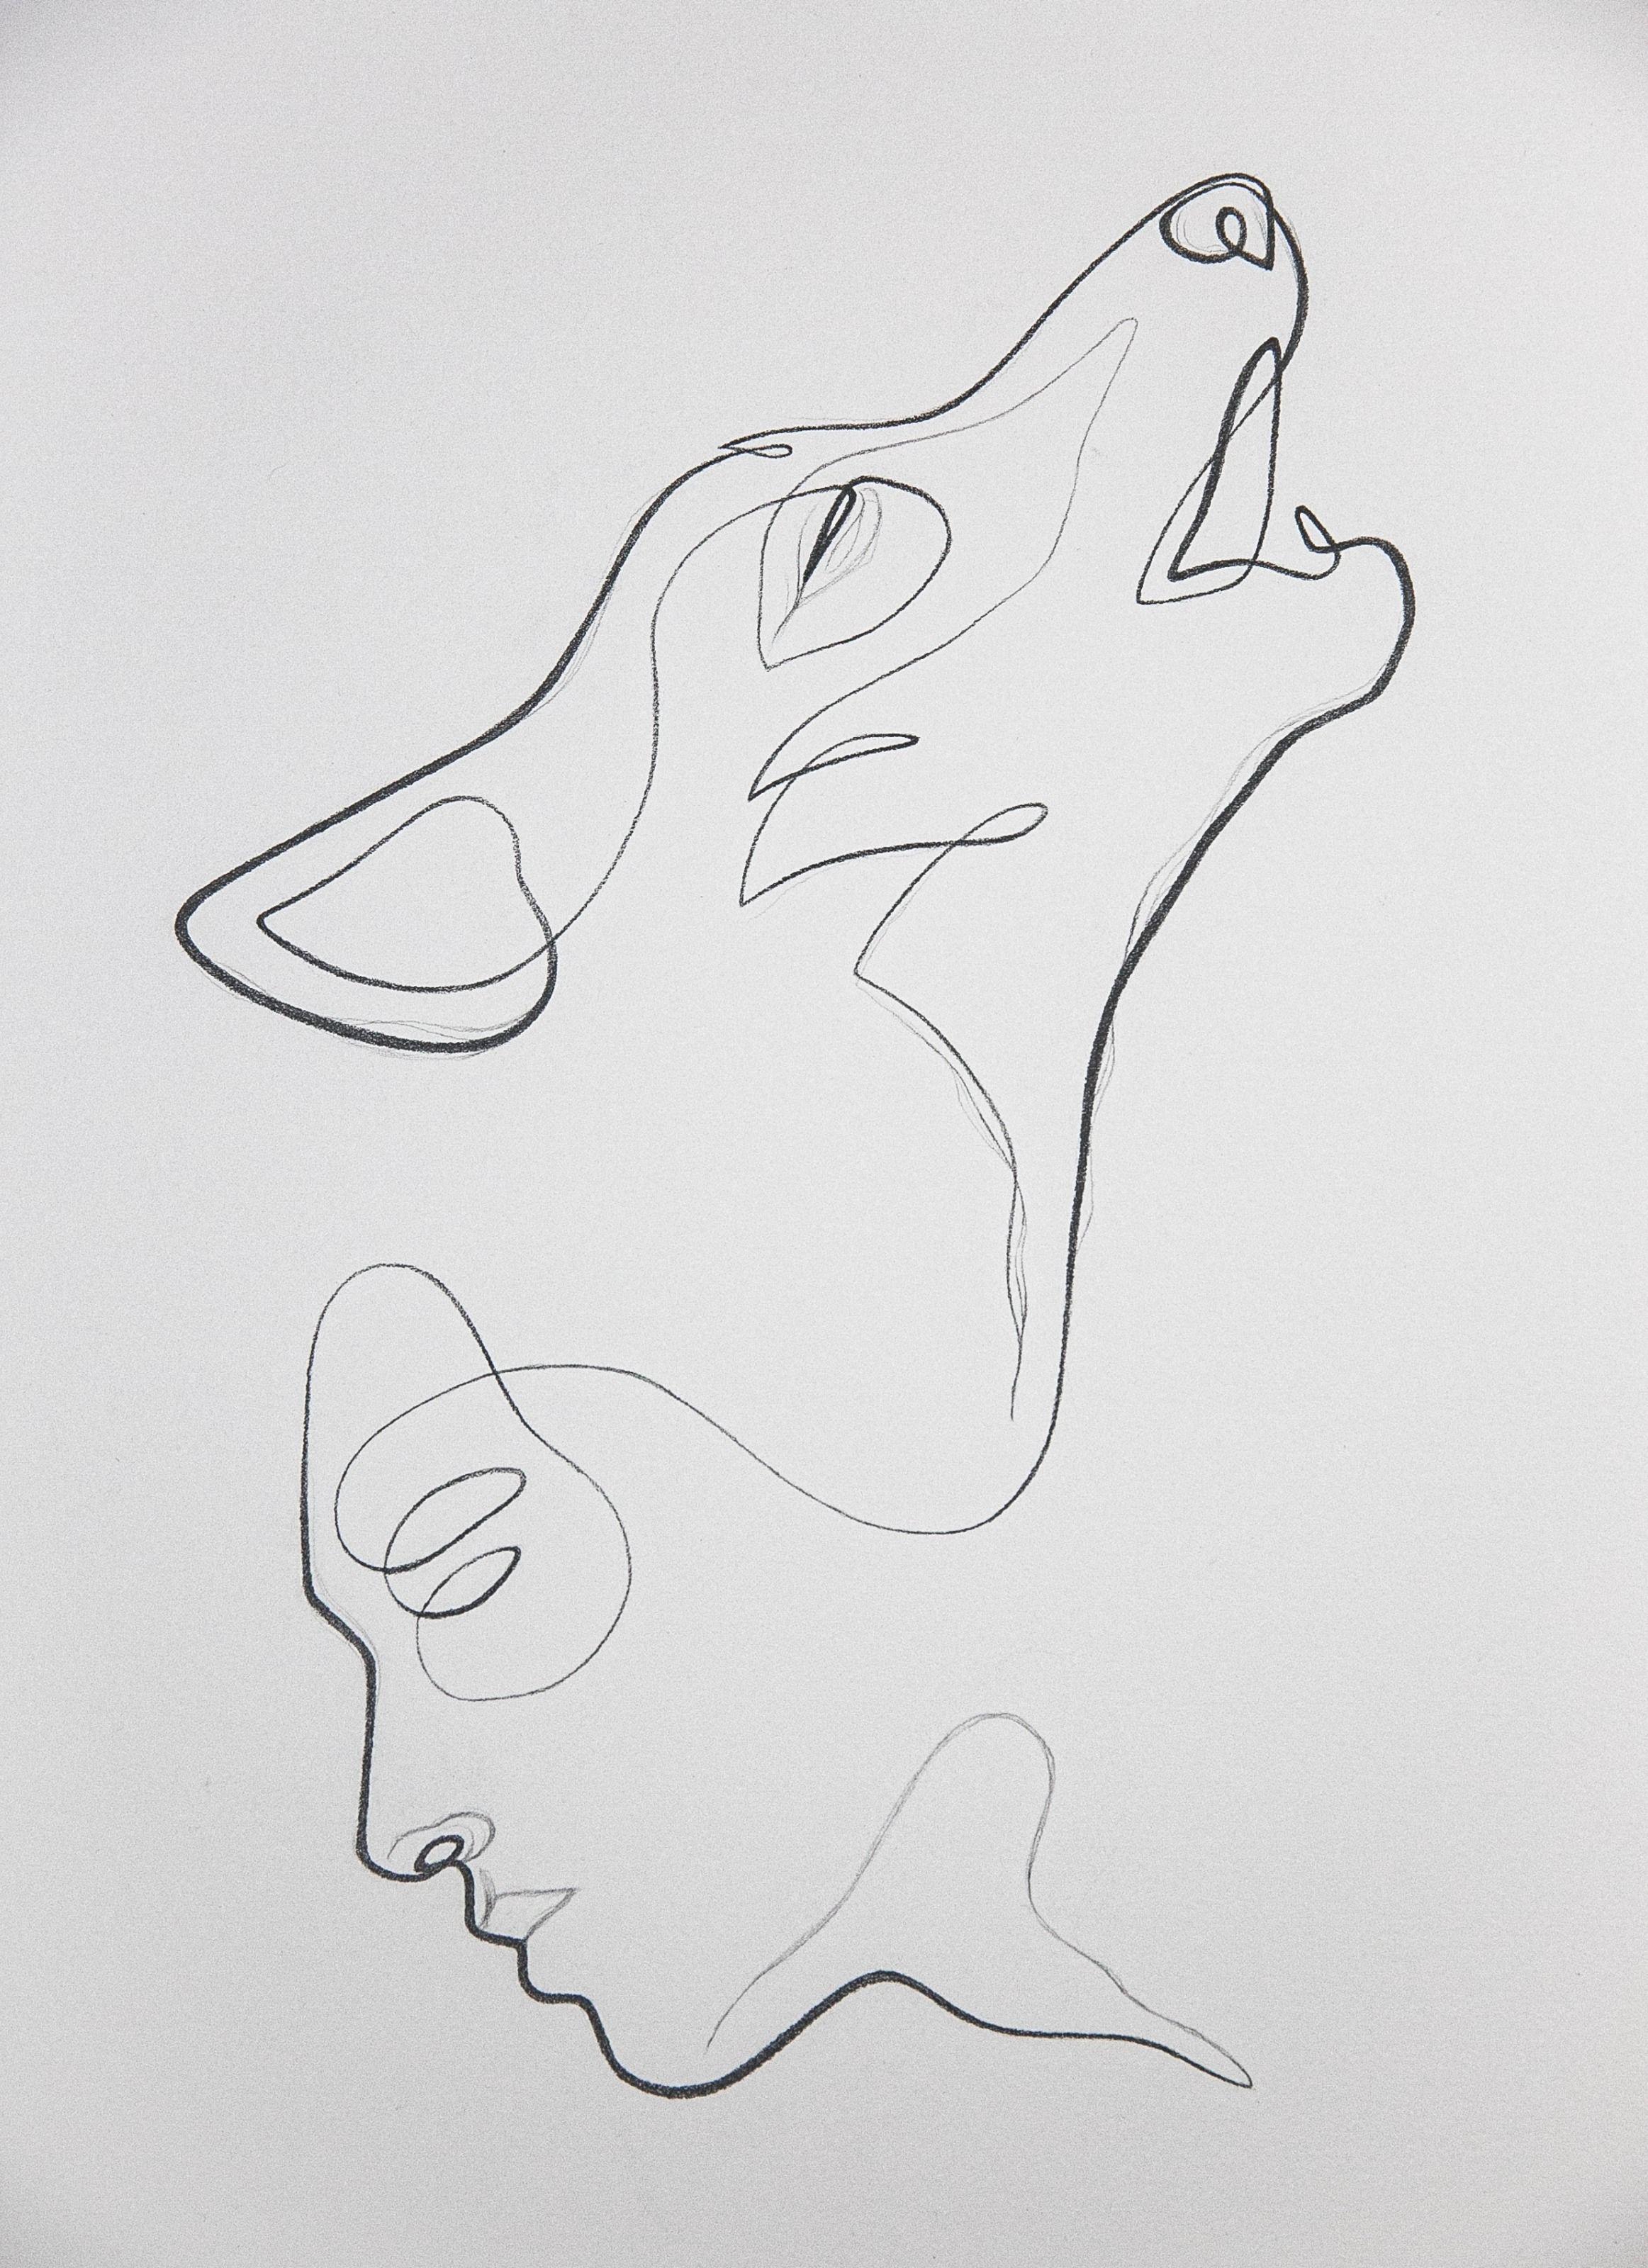 , Minimalist Line Drawing of the Lone Wolf, My Tattoo Blog 2020, My Tattoo Blog 2020